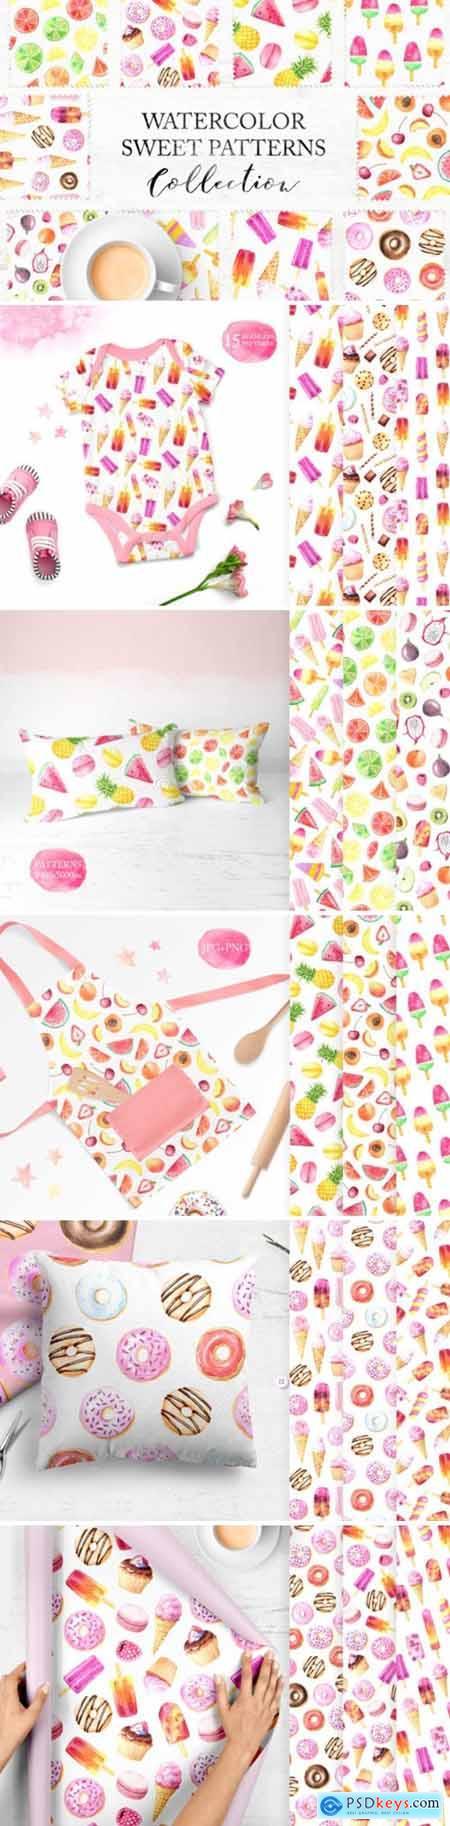 15 Watercolor Sweet Seamless Pattern 3551640